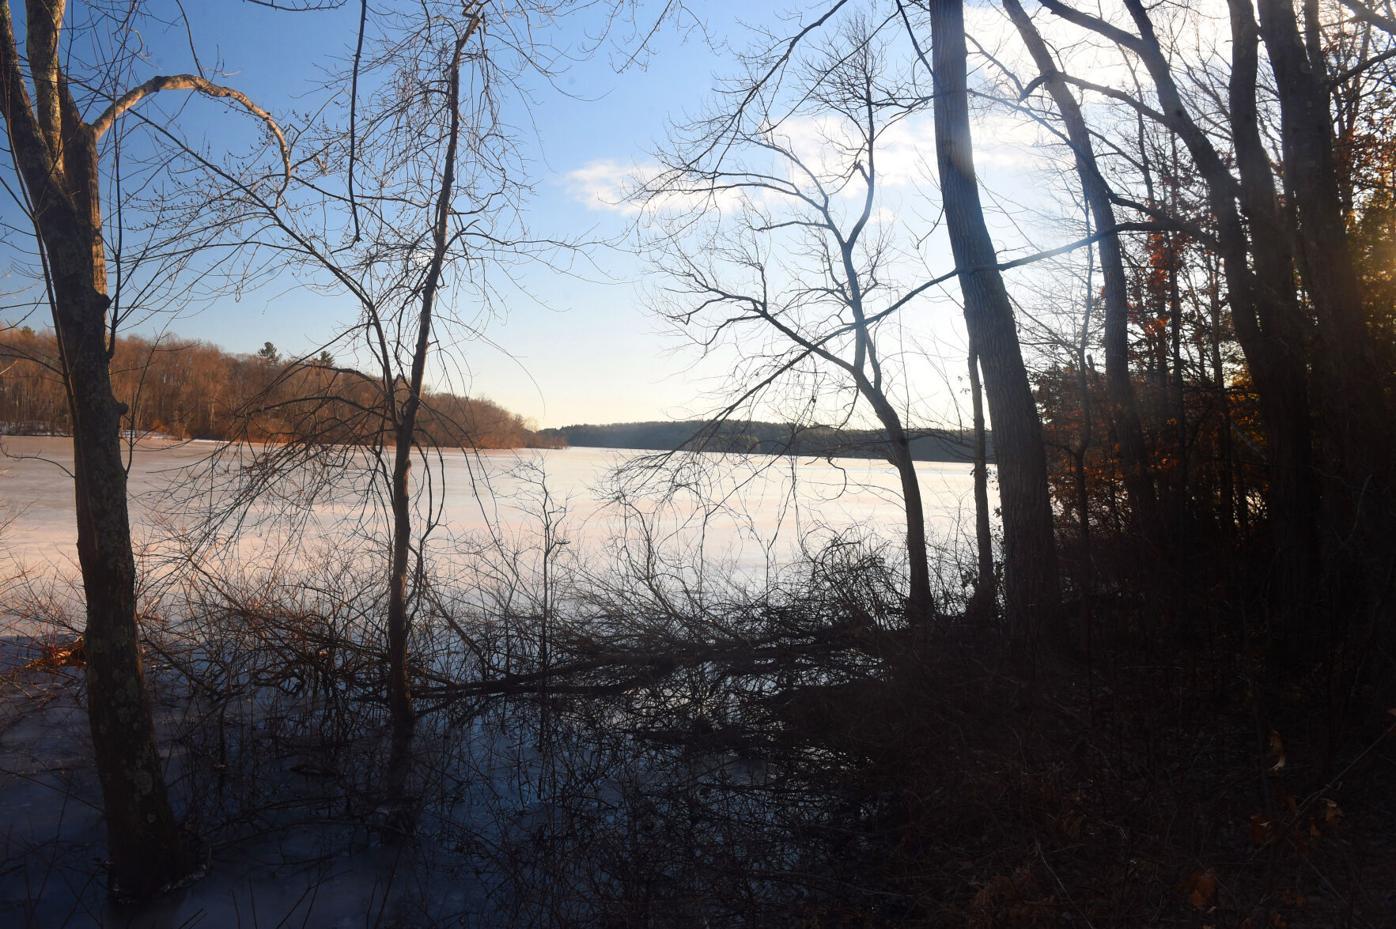 030421 TO Frozen Shenipsit Lake 05.jpg